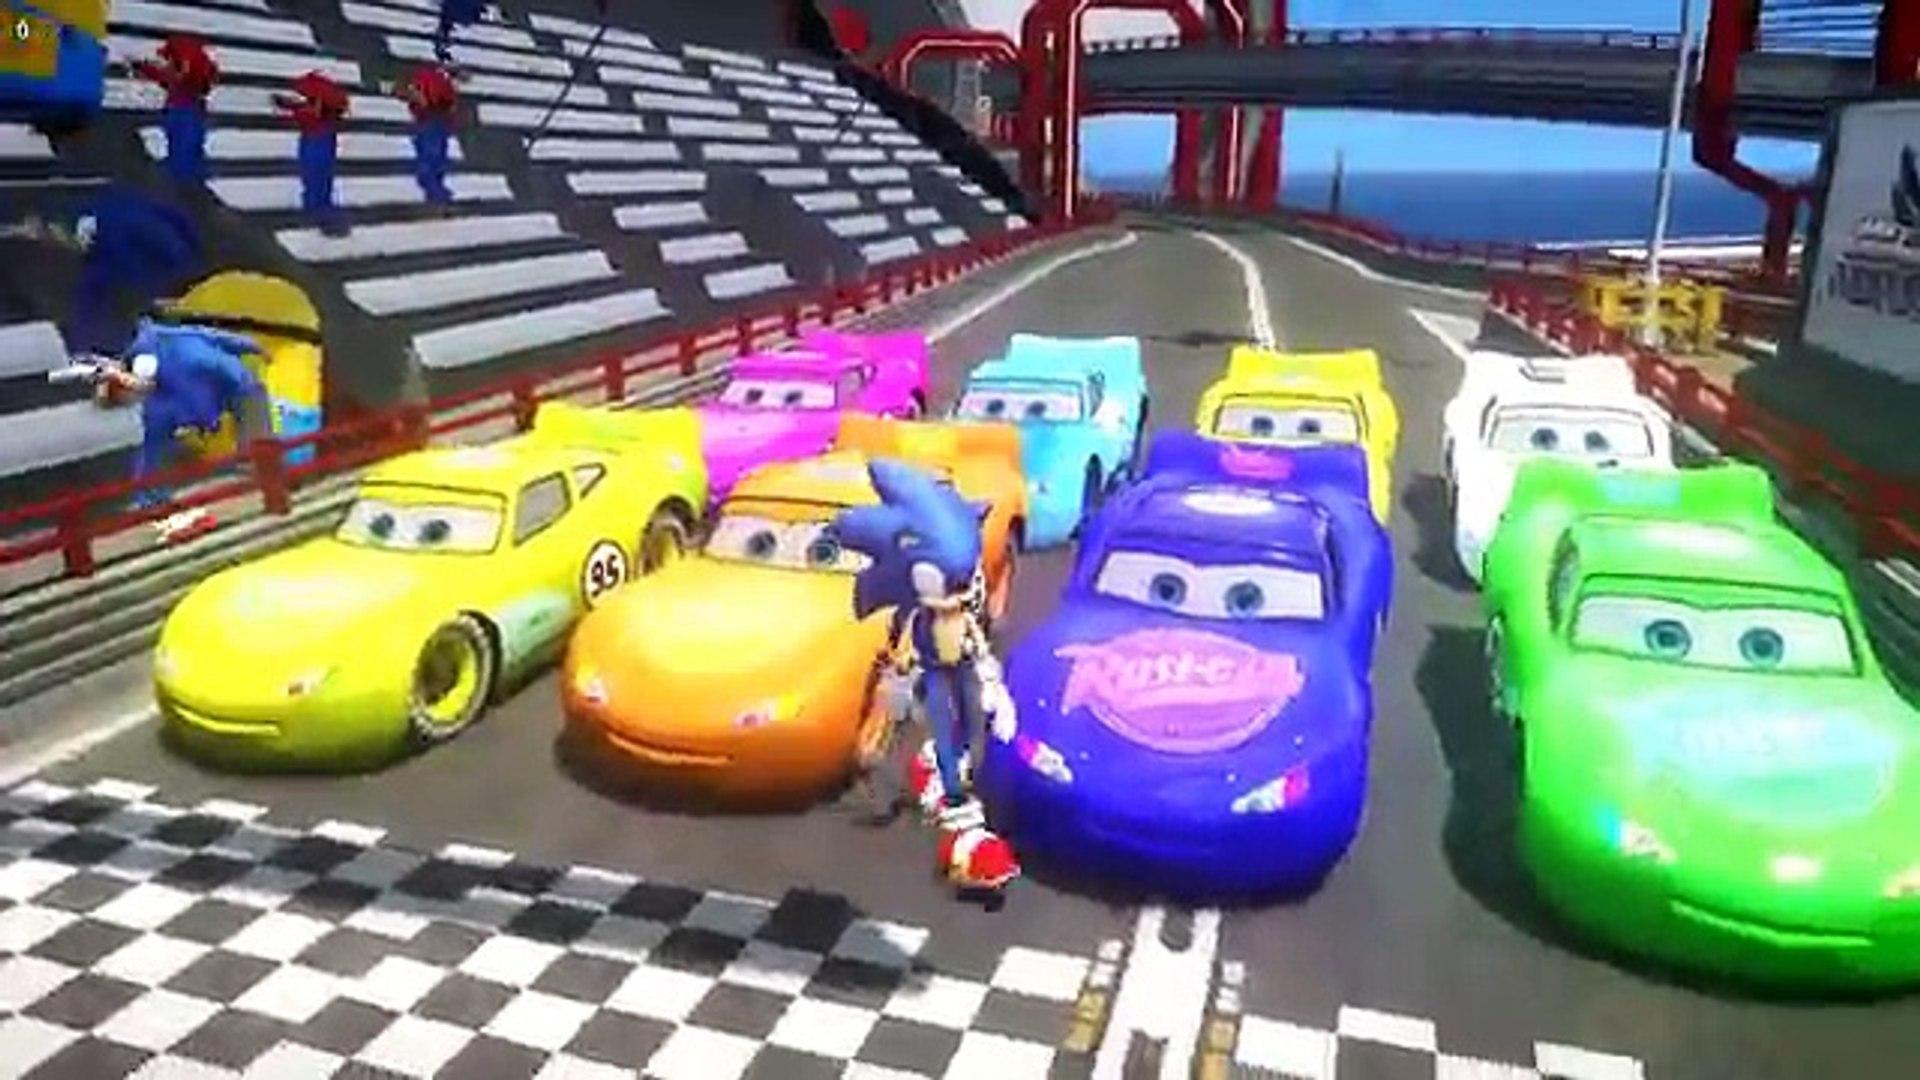 Disney Pixar Sonic And Mario And Minions Dance Vs Lightning Mcqueen Childrens Cartoon Video Video Dailymotion